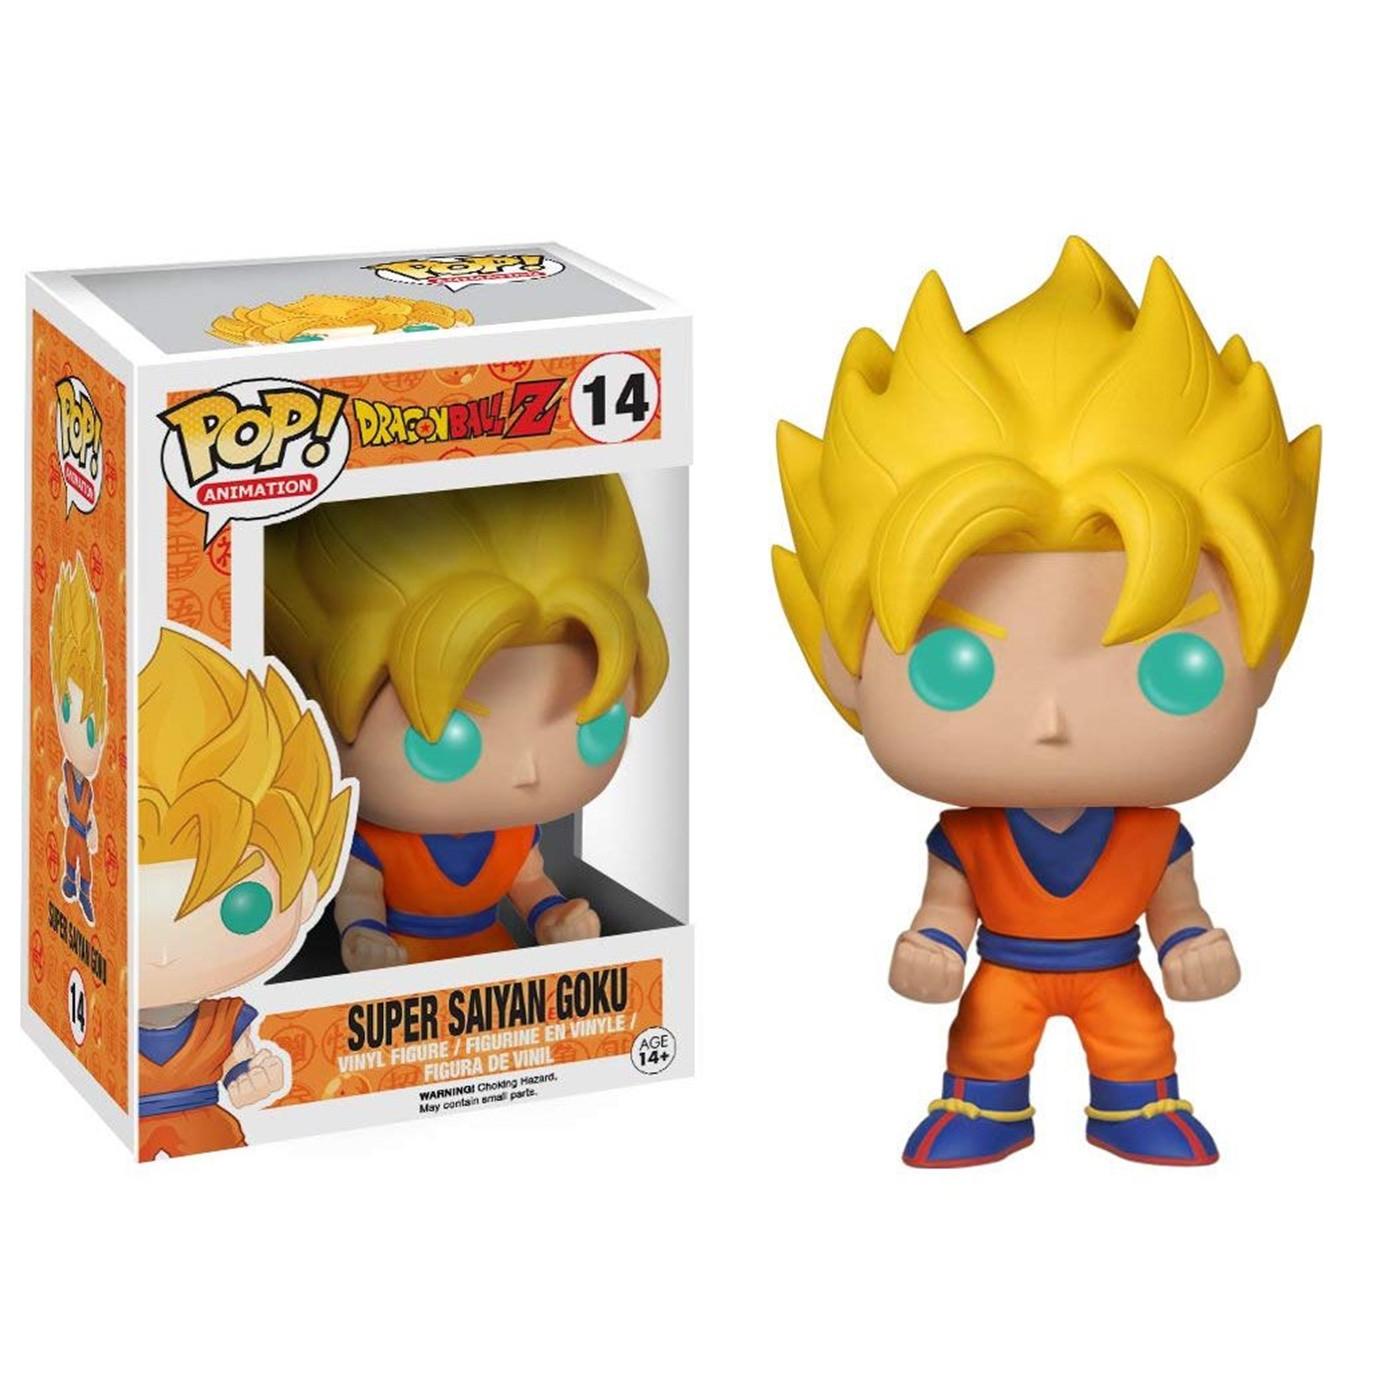 POP! Animation: Dragonball Z- Super Saiyan Goku